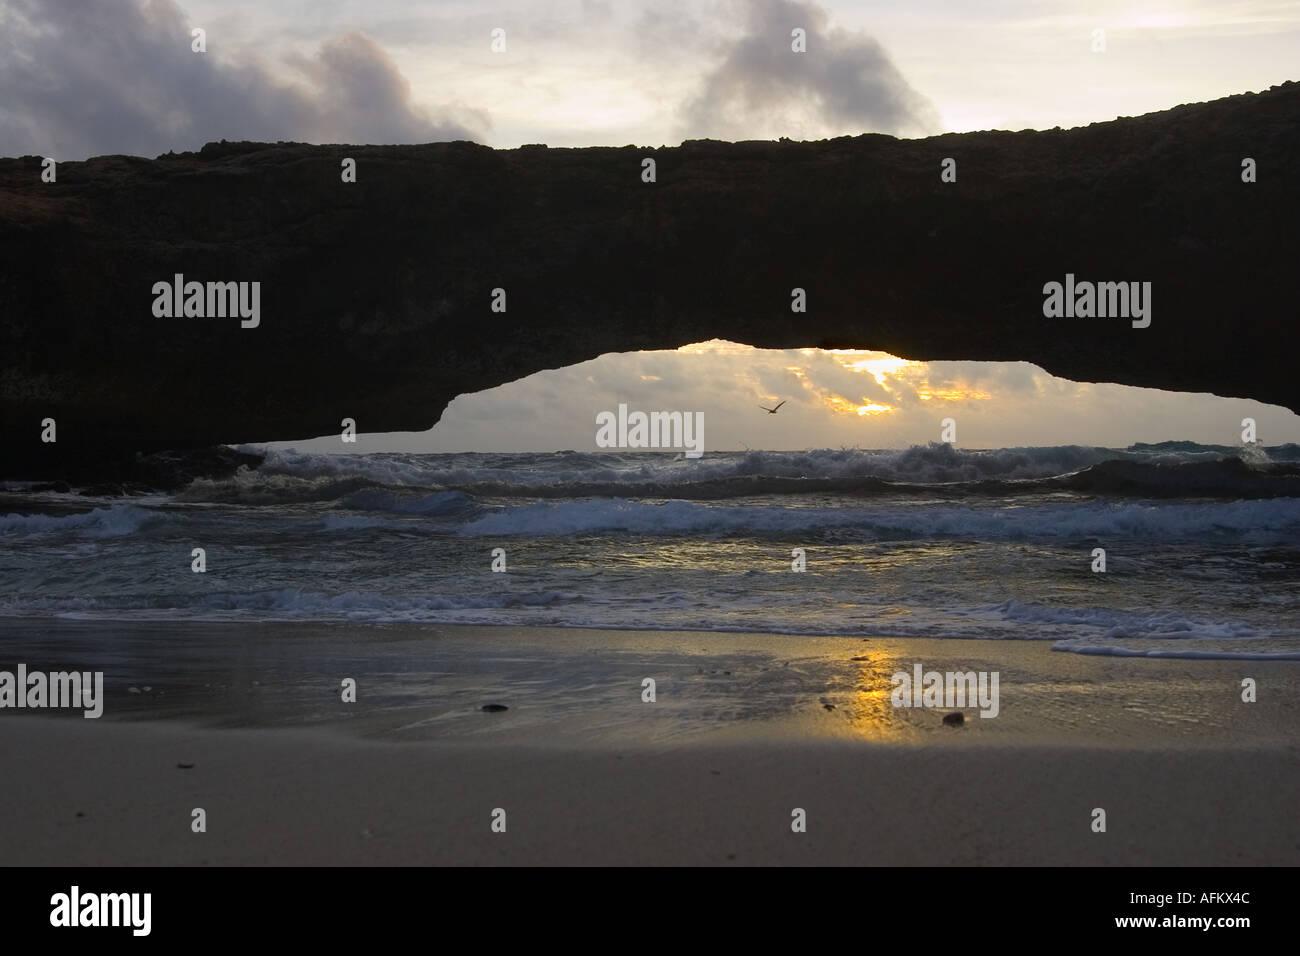 Aruba natürliche Brücke bei Sonnenaufgang mit Pelikan silhouette Stockbild